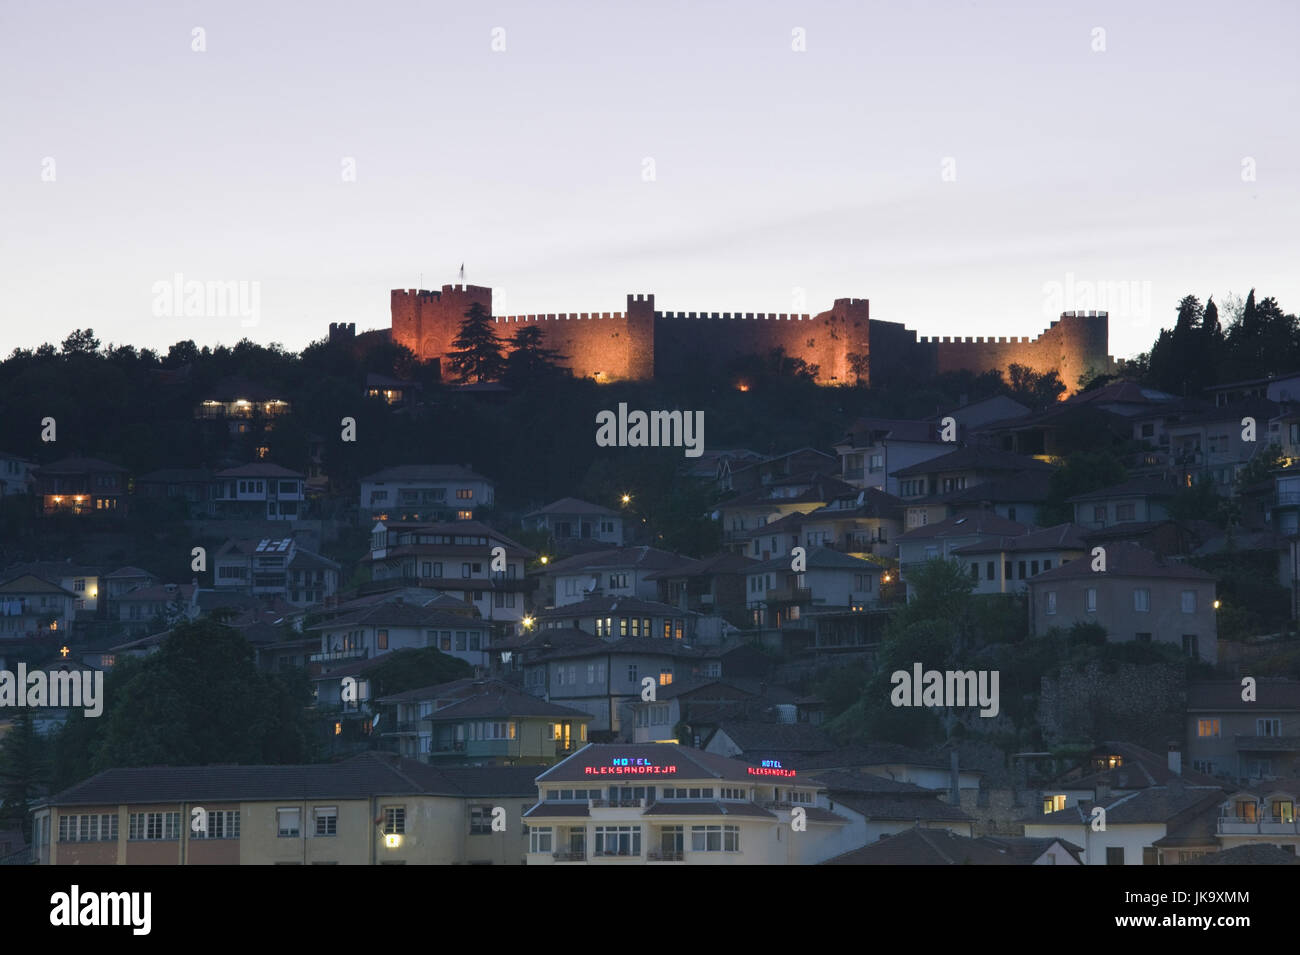 Mazedonien, Ohrid, Festung, Altstadt, Abend, - Stock Image